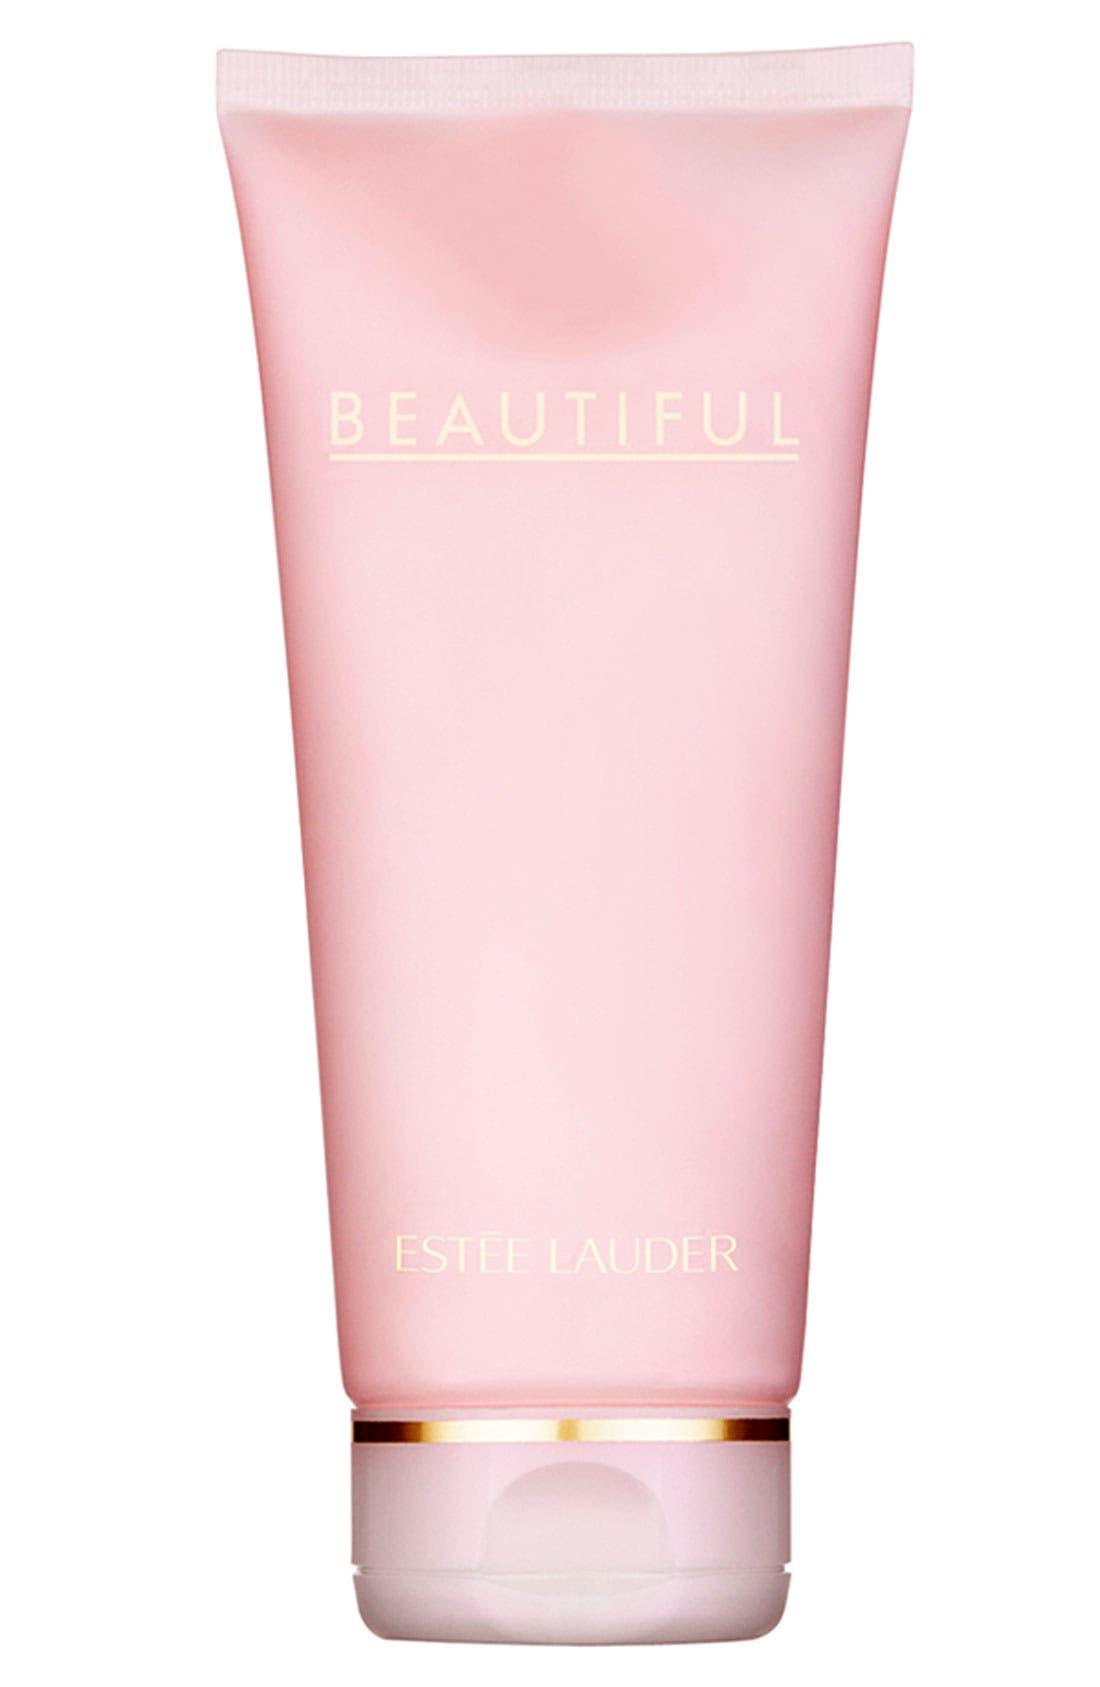 Beautiful Bath & Shower Gelée,                             Main thumbnail 1, color,                             000